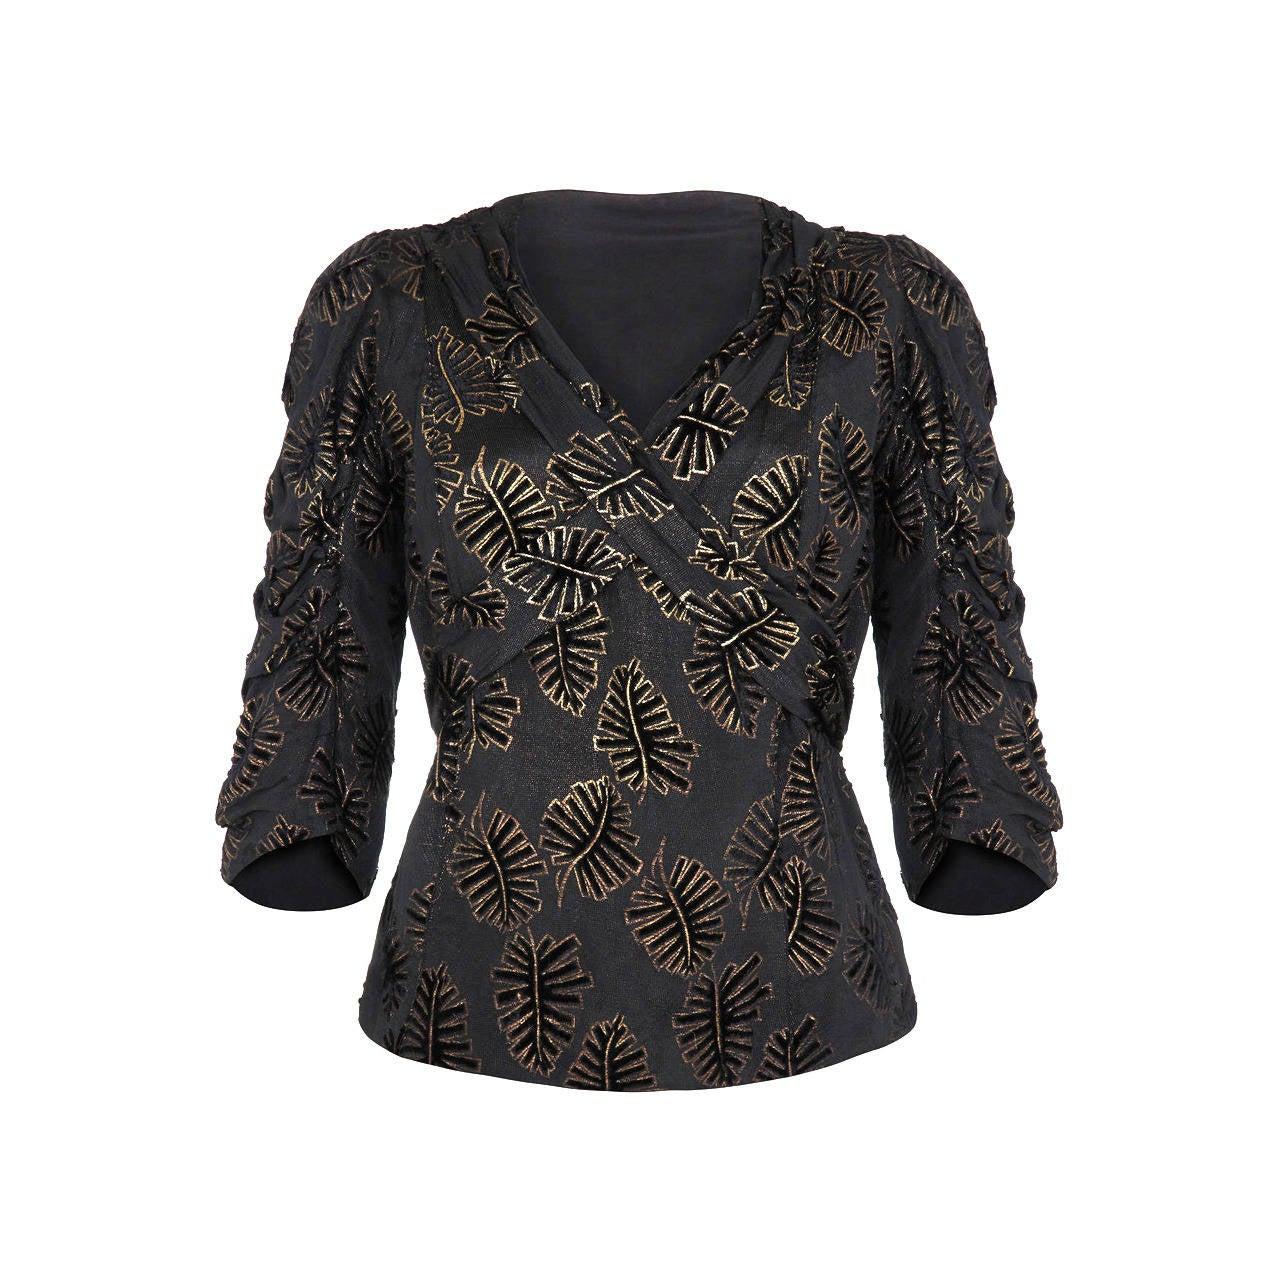 1930s Black and Gold Leaf Velvet Lame Top For Sale